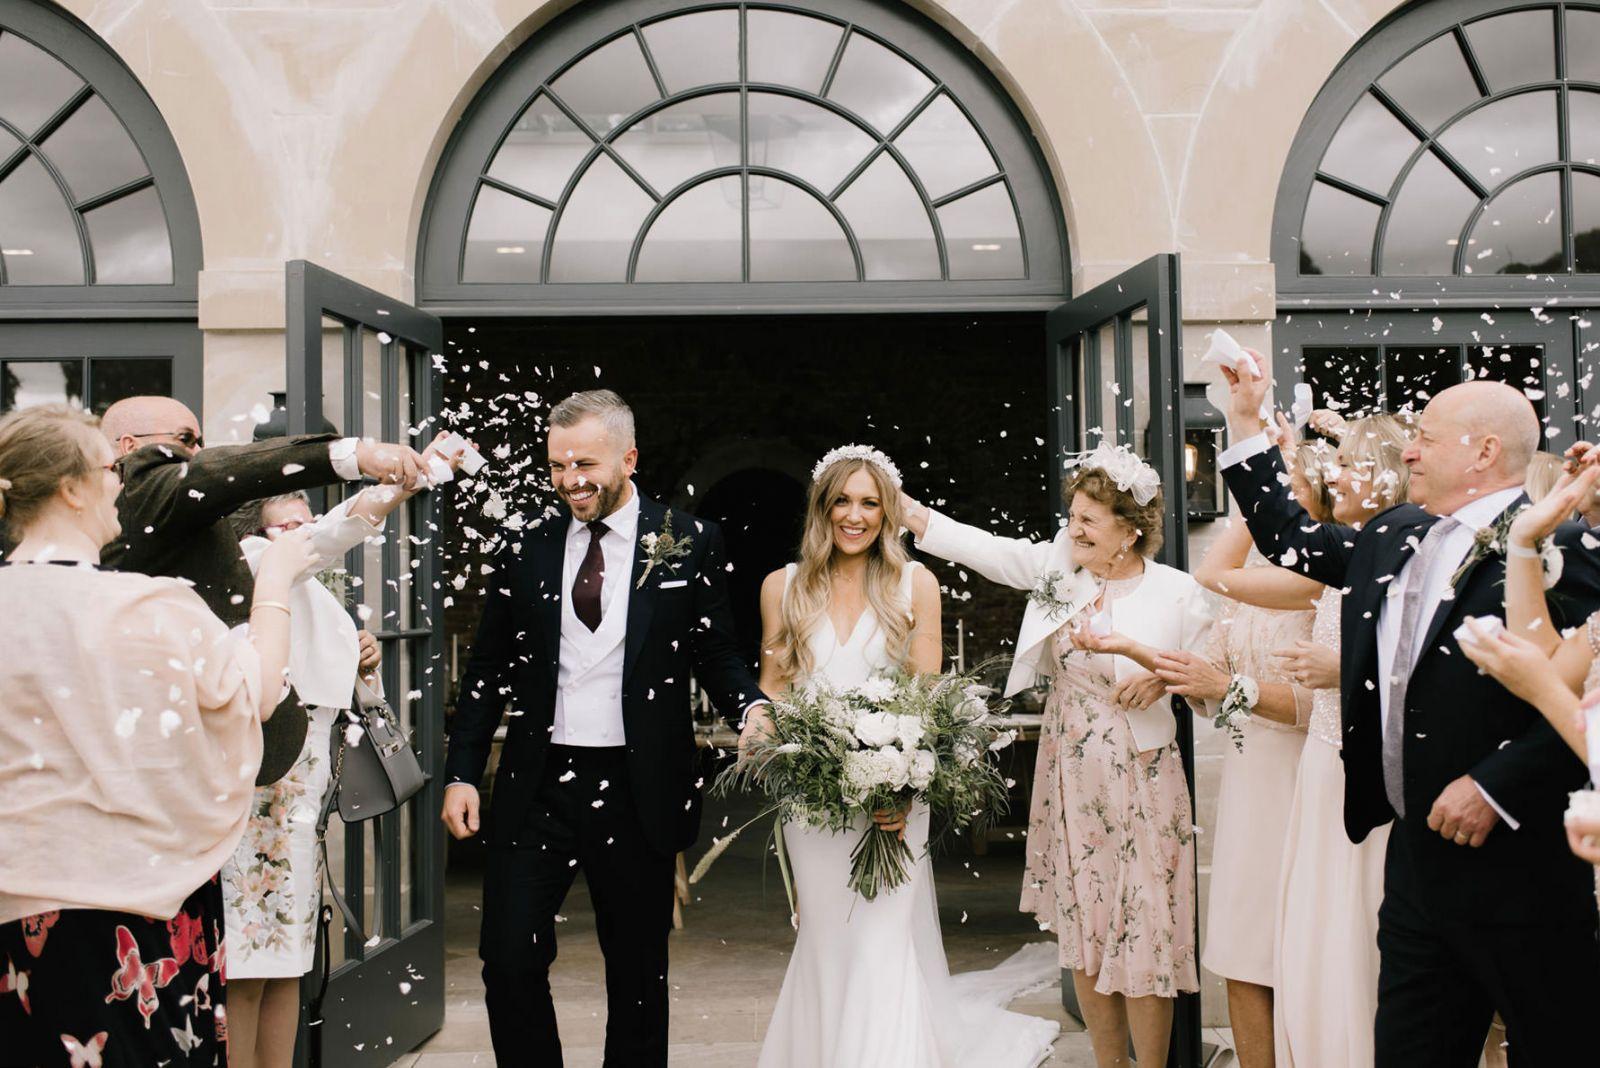 Yorkshire Wedding Photography confetti moments